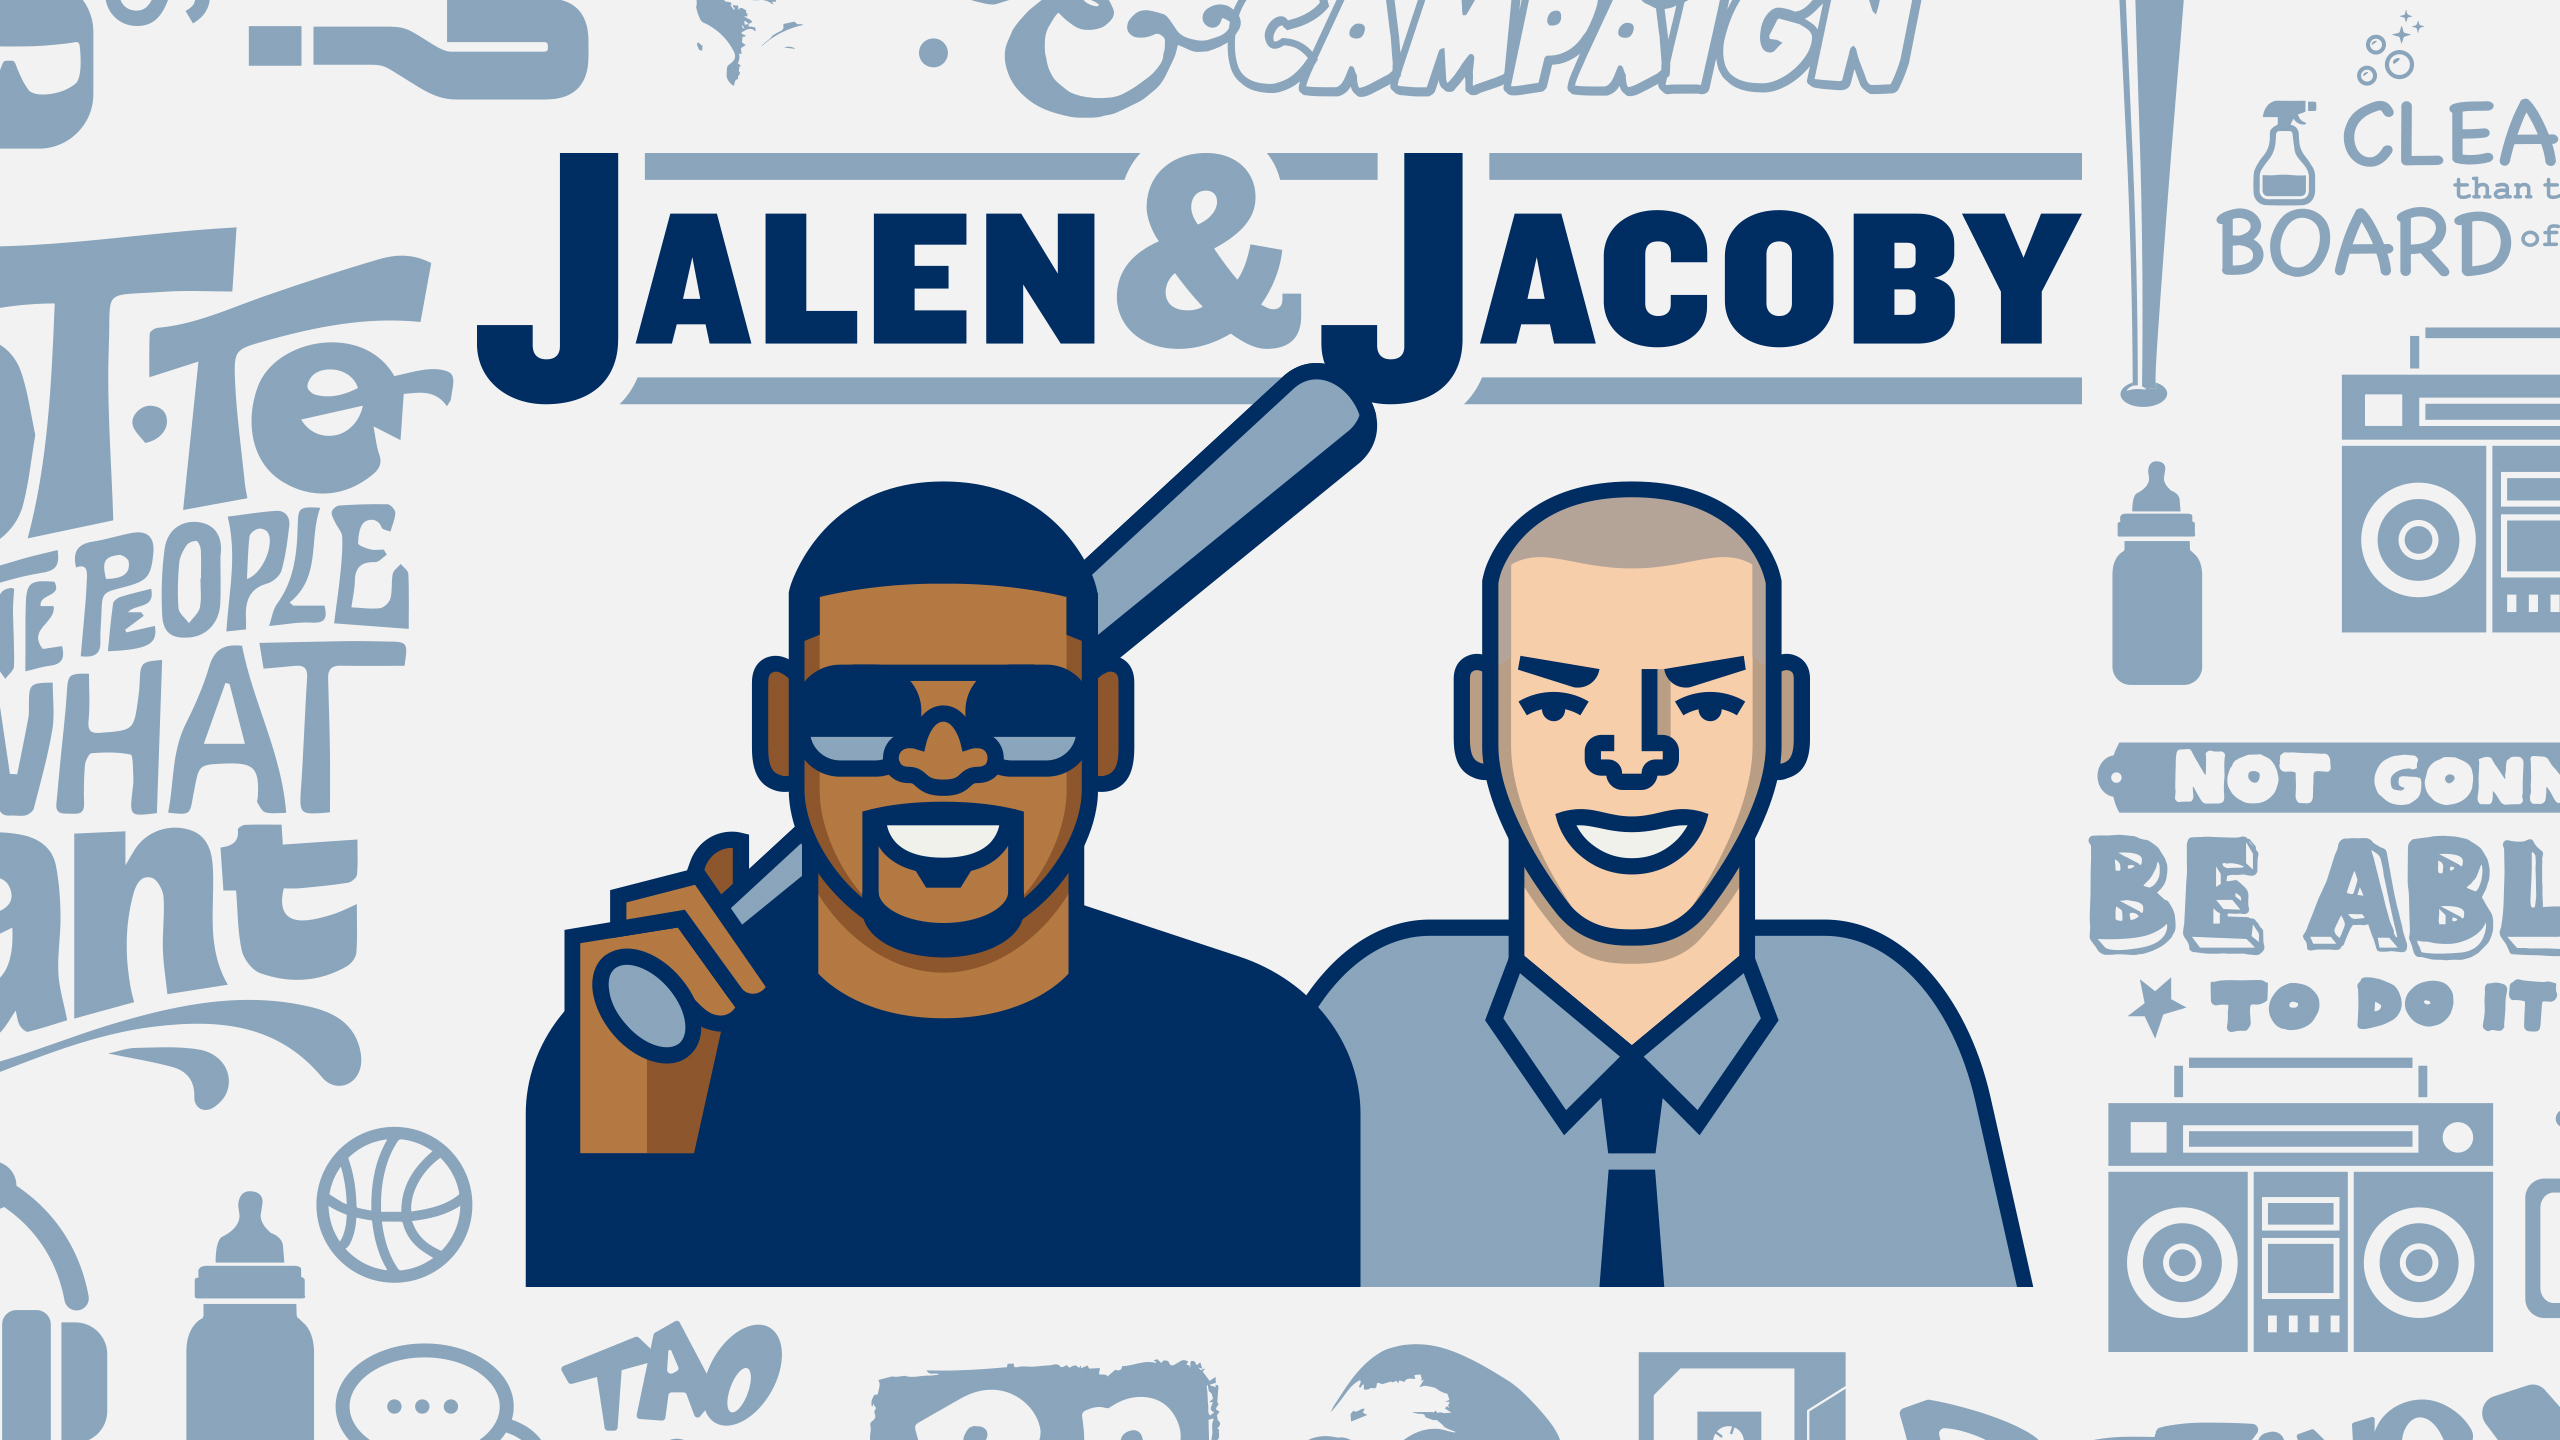 Mon, 9/17 - Jalen & Jacoby